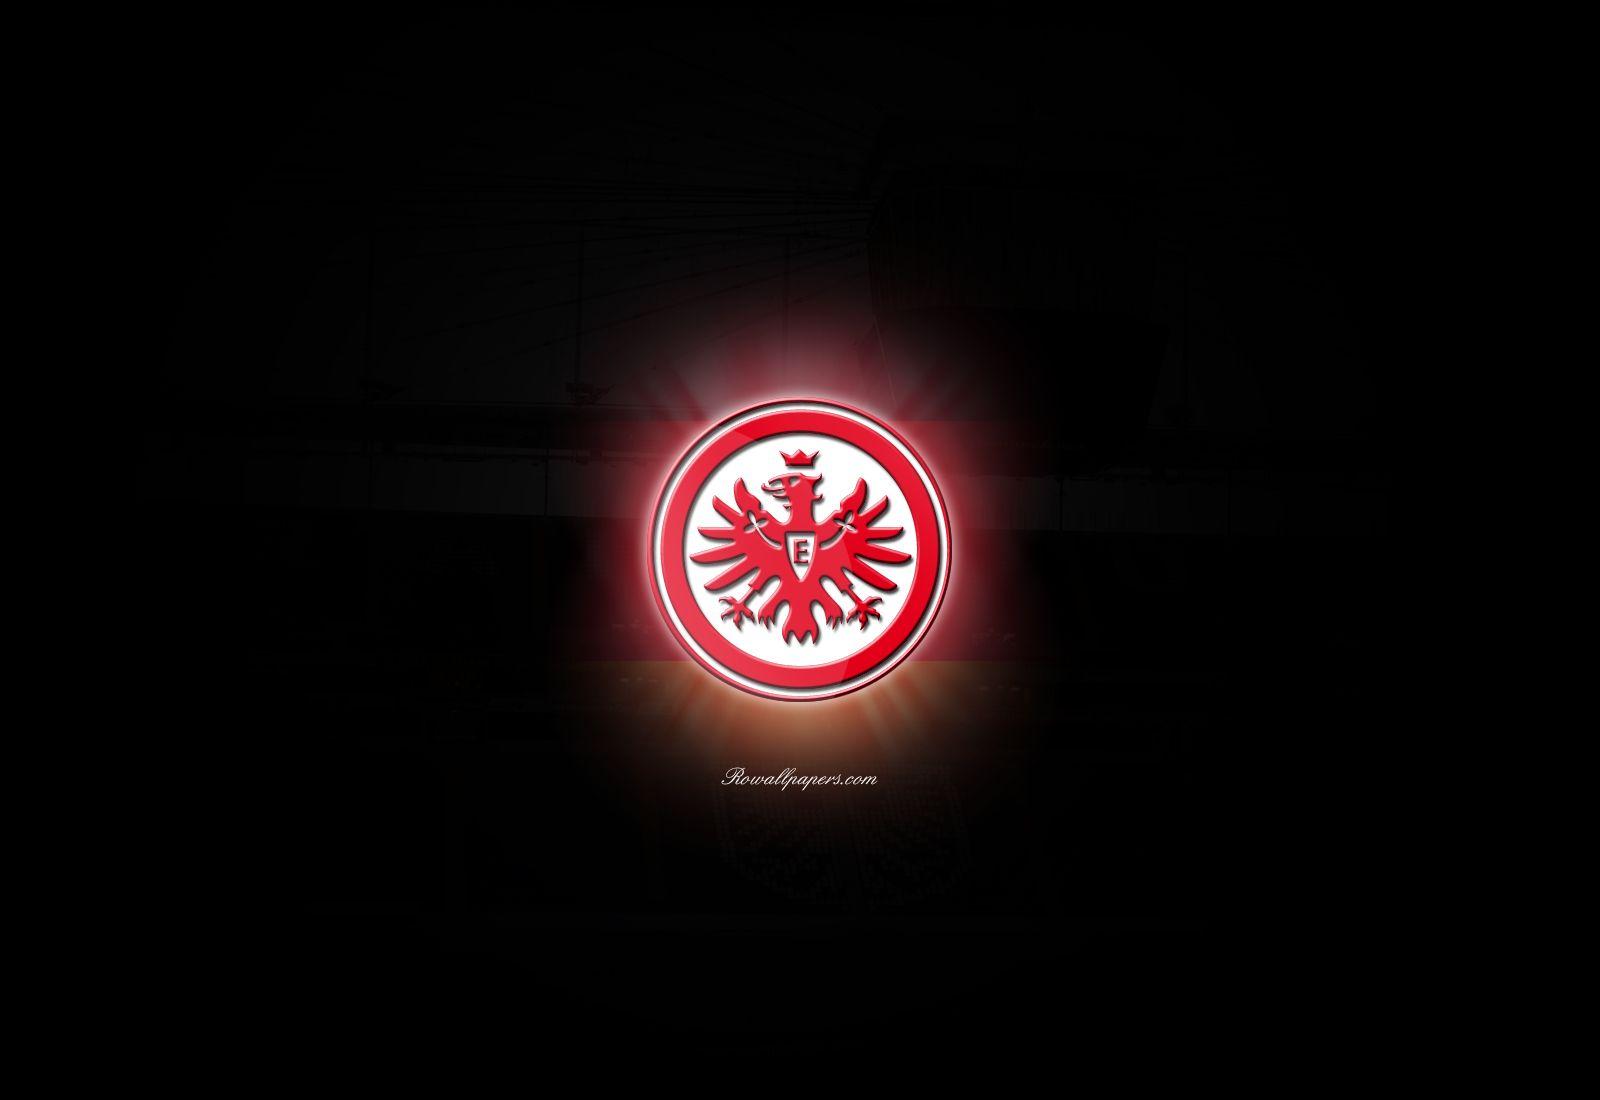 Eintracht Frankfurt Logo Sport Wallpaper Black 8516 Wallpaper